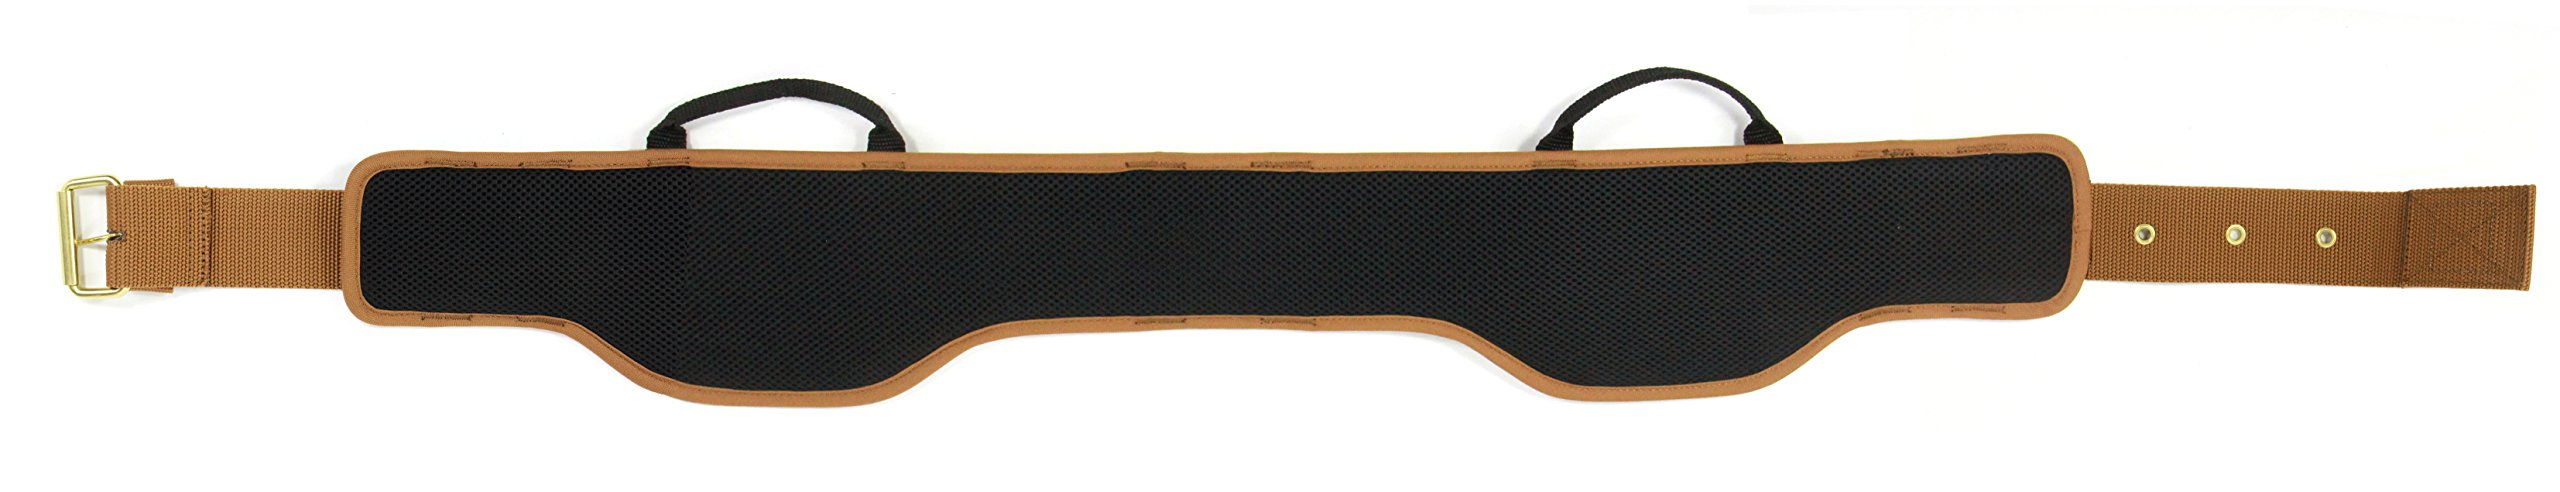 Carhartt Legacy Build Your Own Belt Custom Tool Belt, Padded by Carhartt (Image #2)